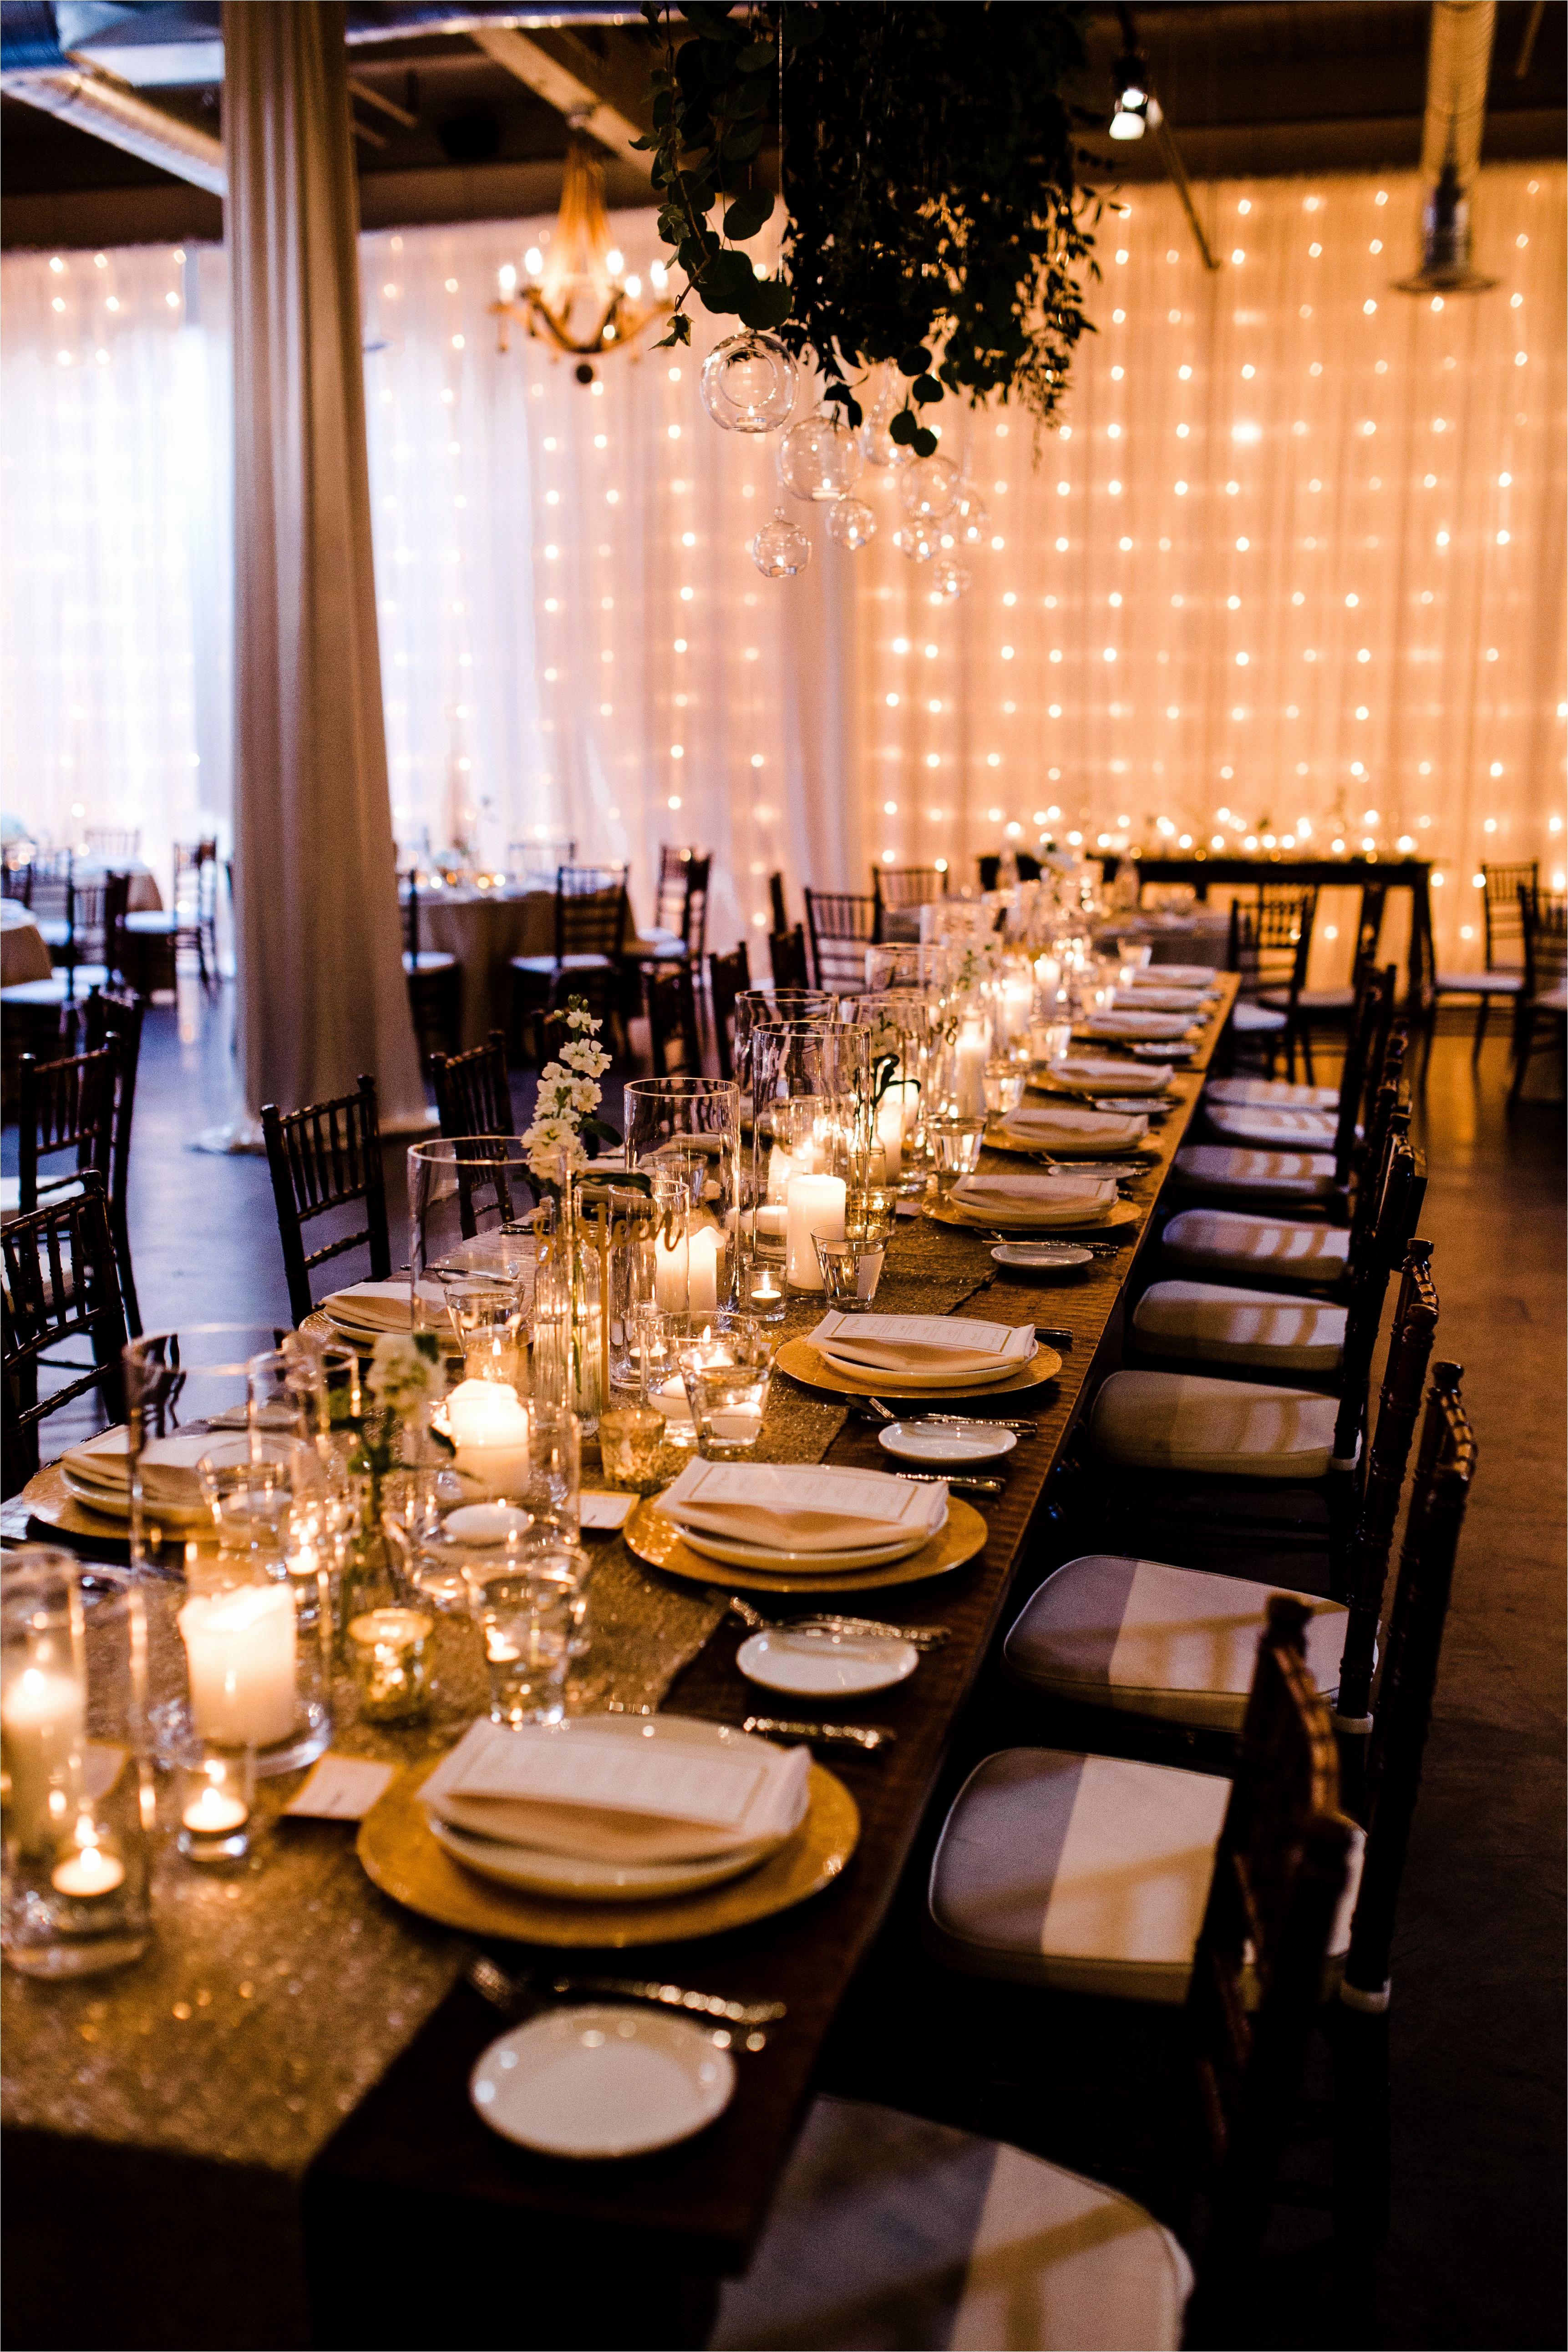 Free Photo Restaurant Table Glass Plate Restaurant Free Download Jooinn